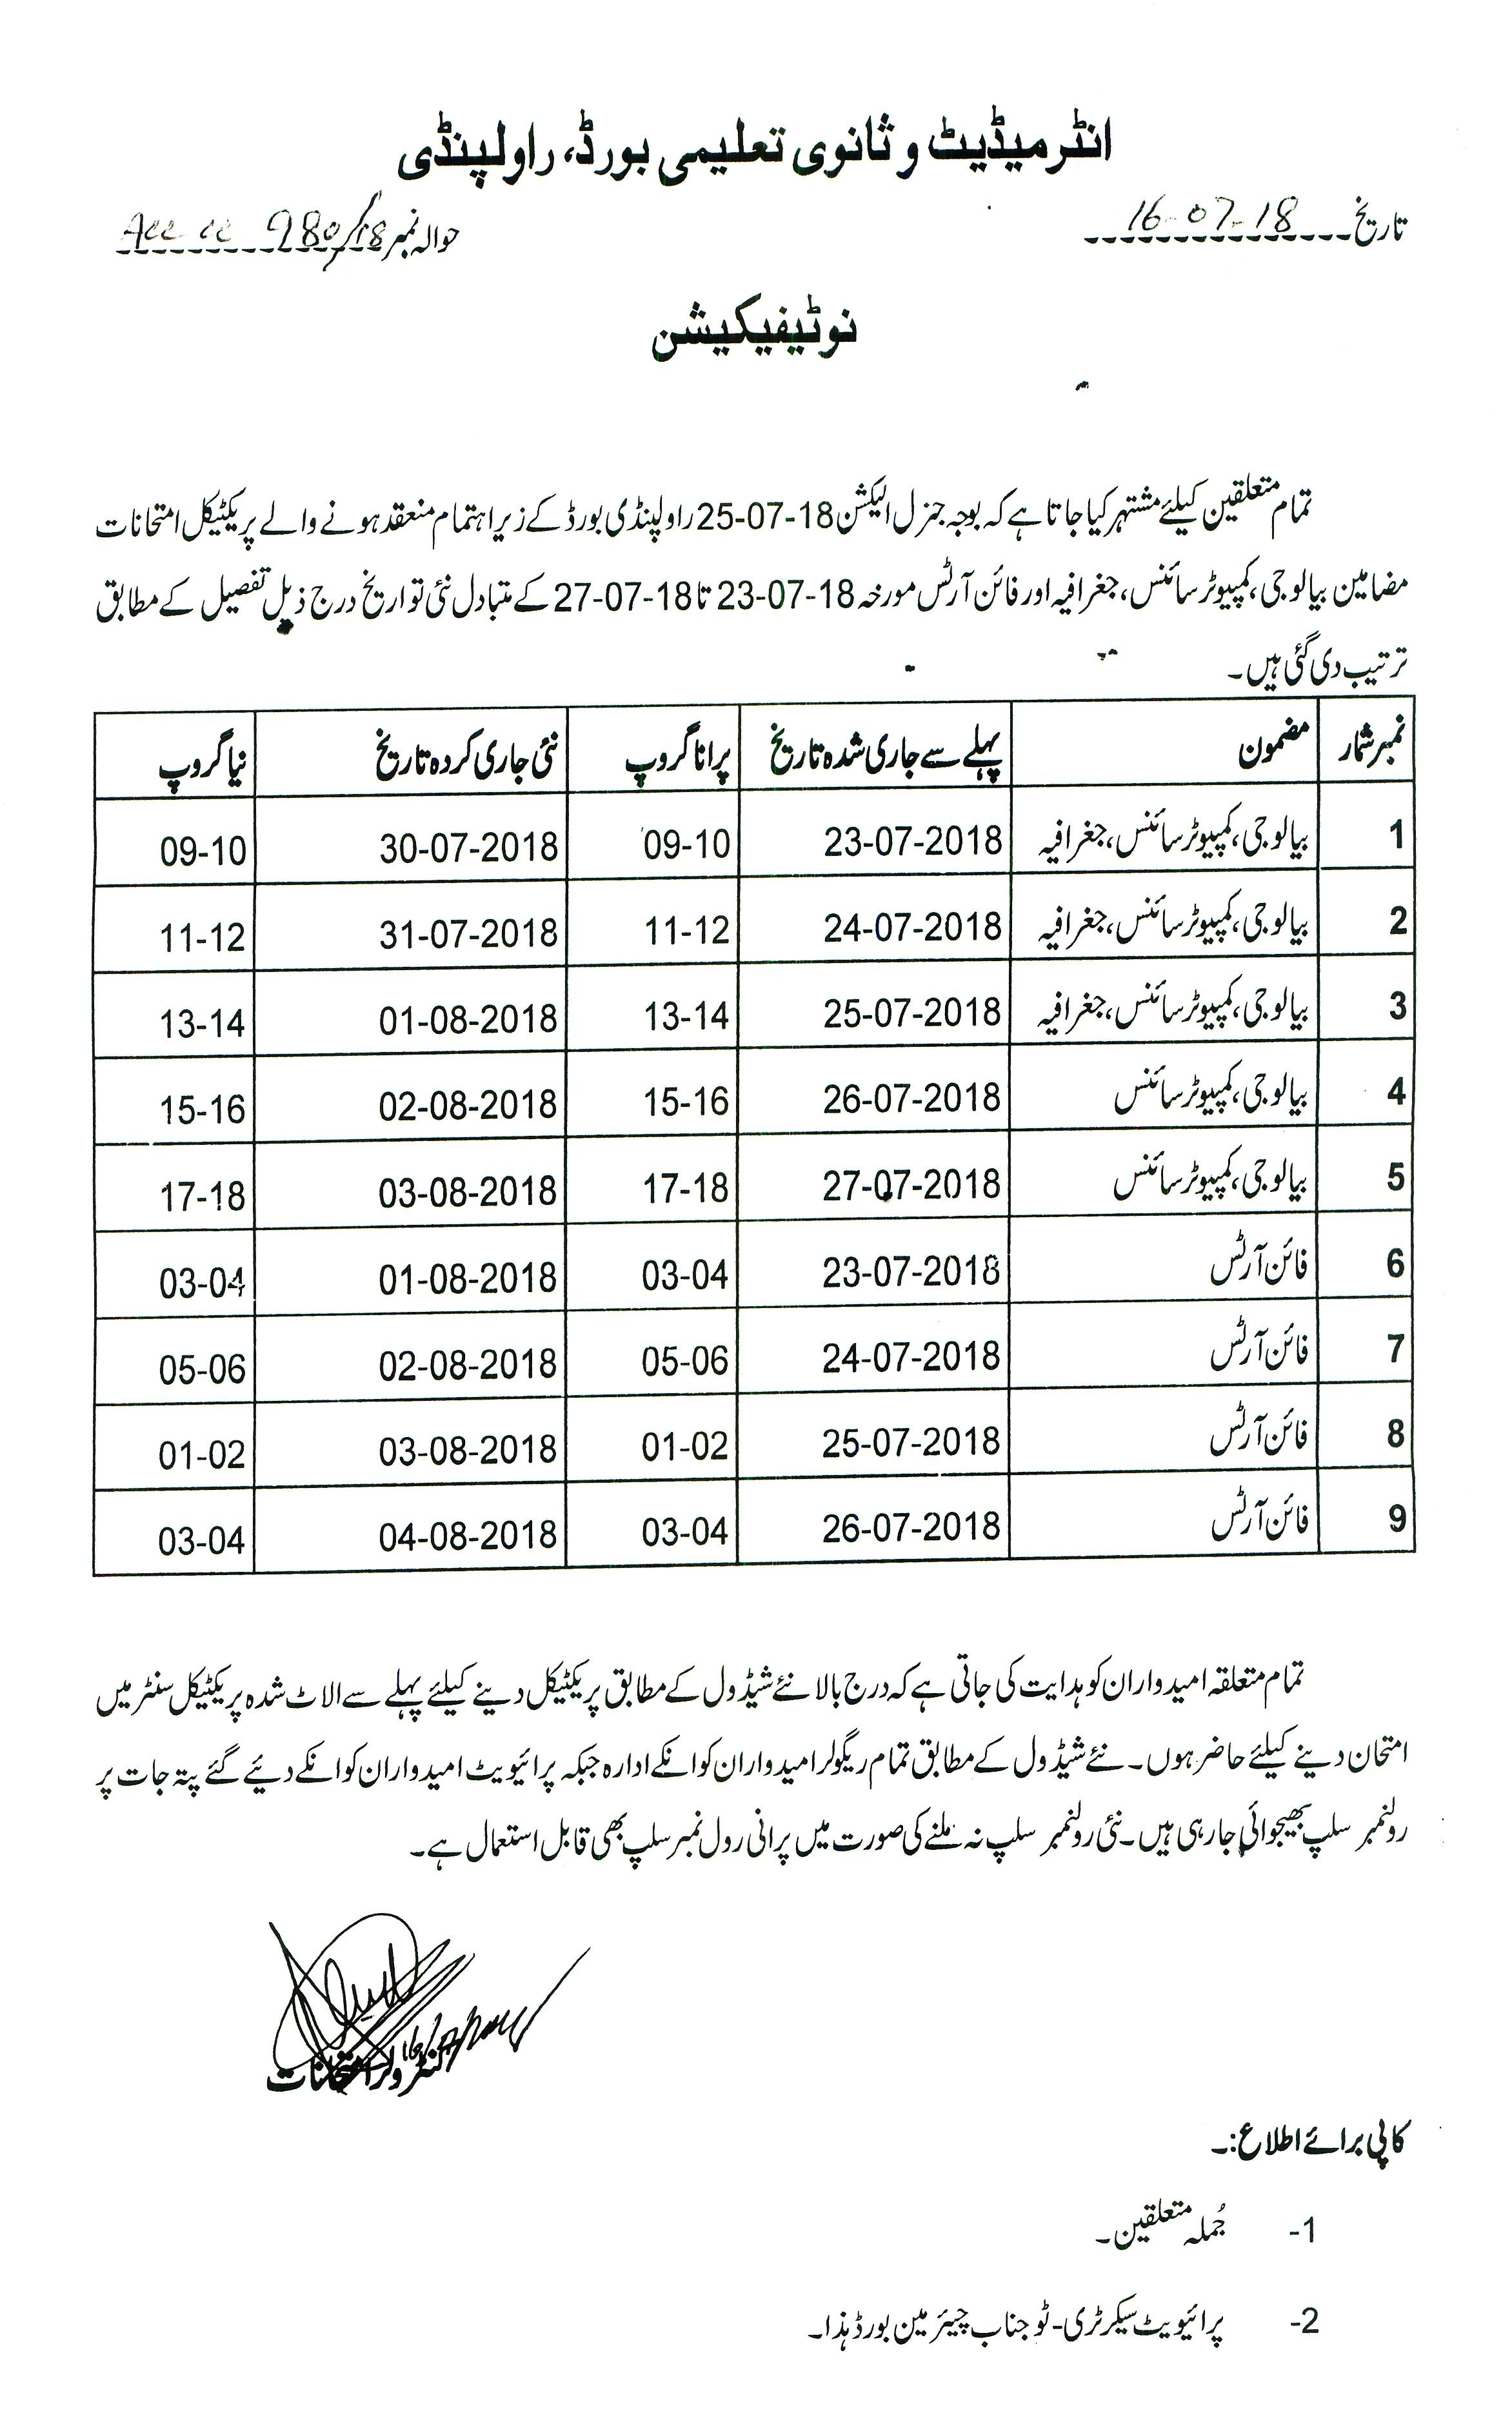 BISE Rawalpindi Board Date Sheet 2019 Matric Part 1 2, 9th